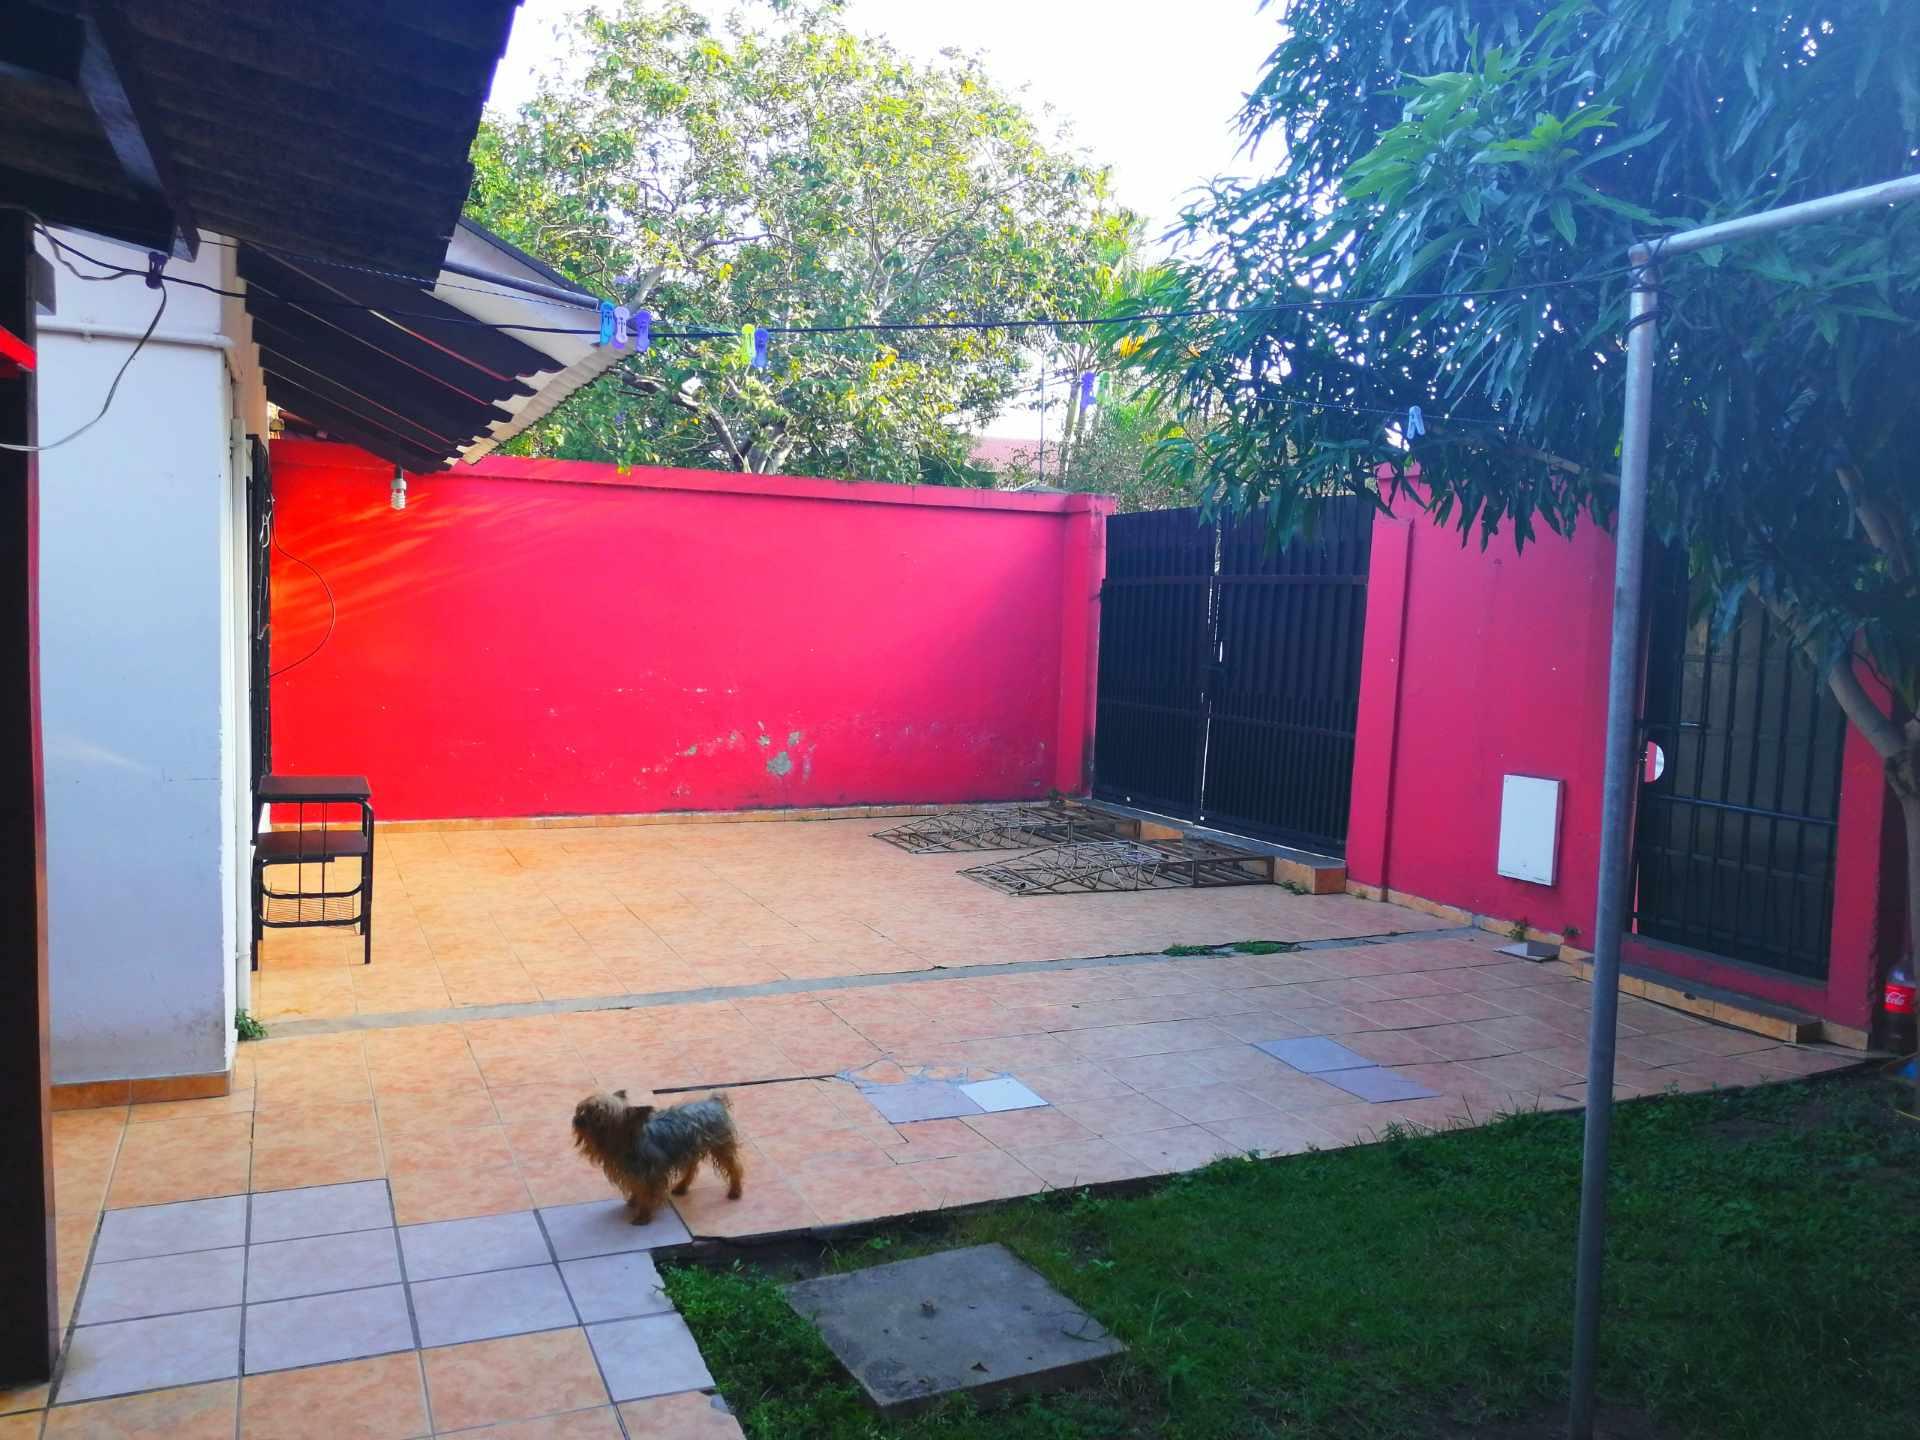 Casa en Venta ZONA NORTE - 4TO ANILLO (CASA) Foto 1